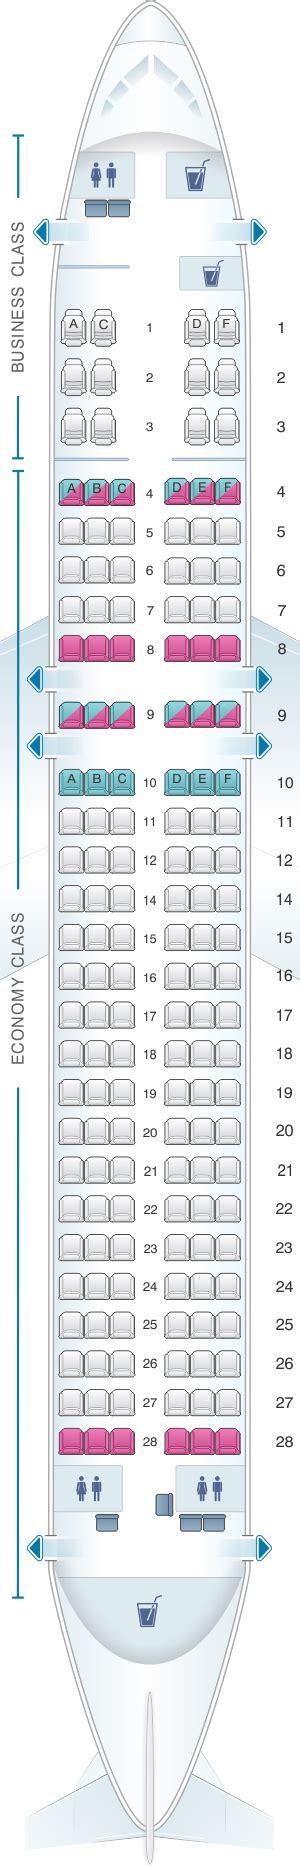 plan des sieges airbus a320 plan de cabine philippine airlines airbus a320 200